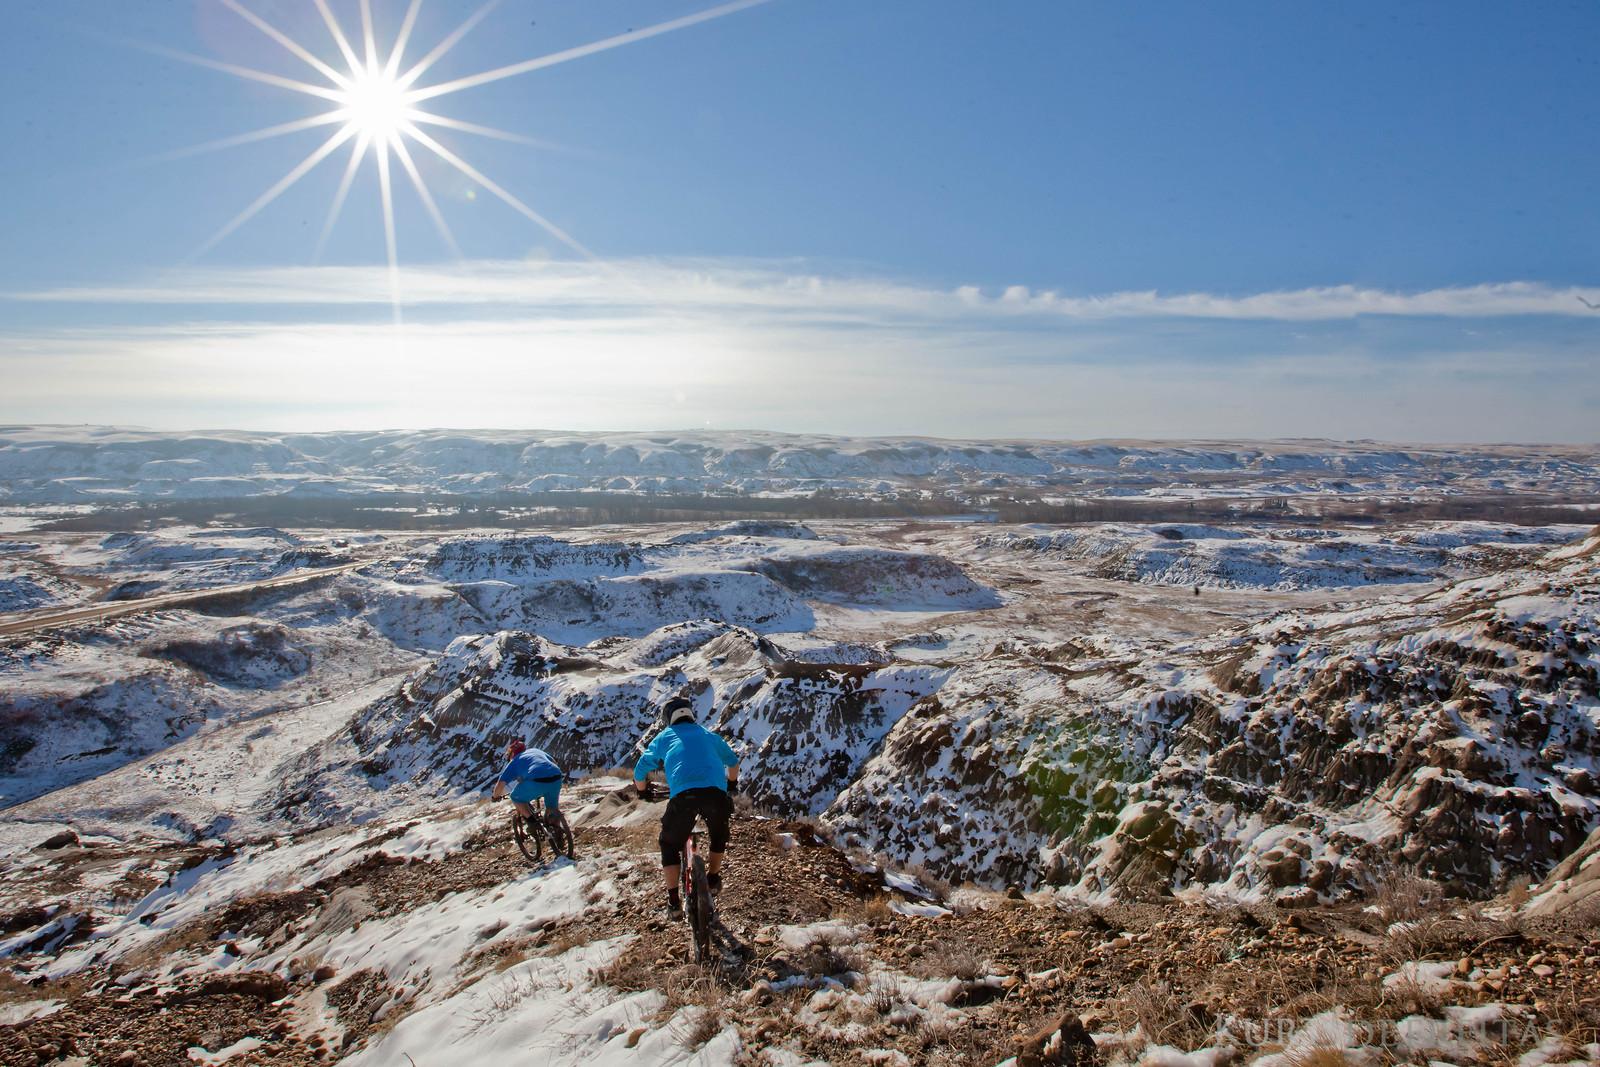 Winter flare  - Kurtdefreitas - Mountain Biking Pictures - Vital MTB